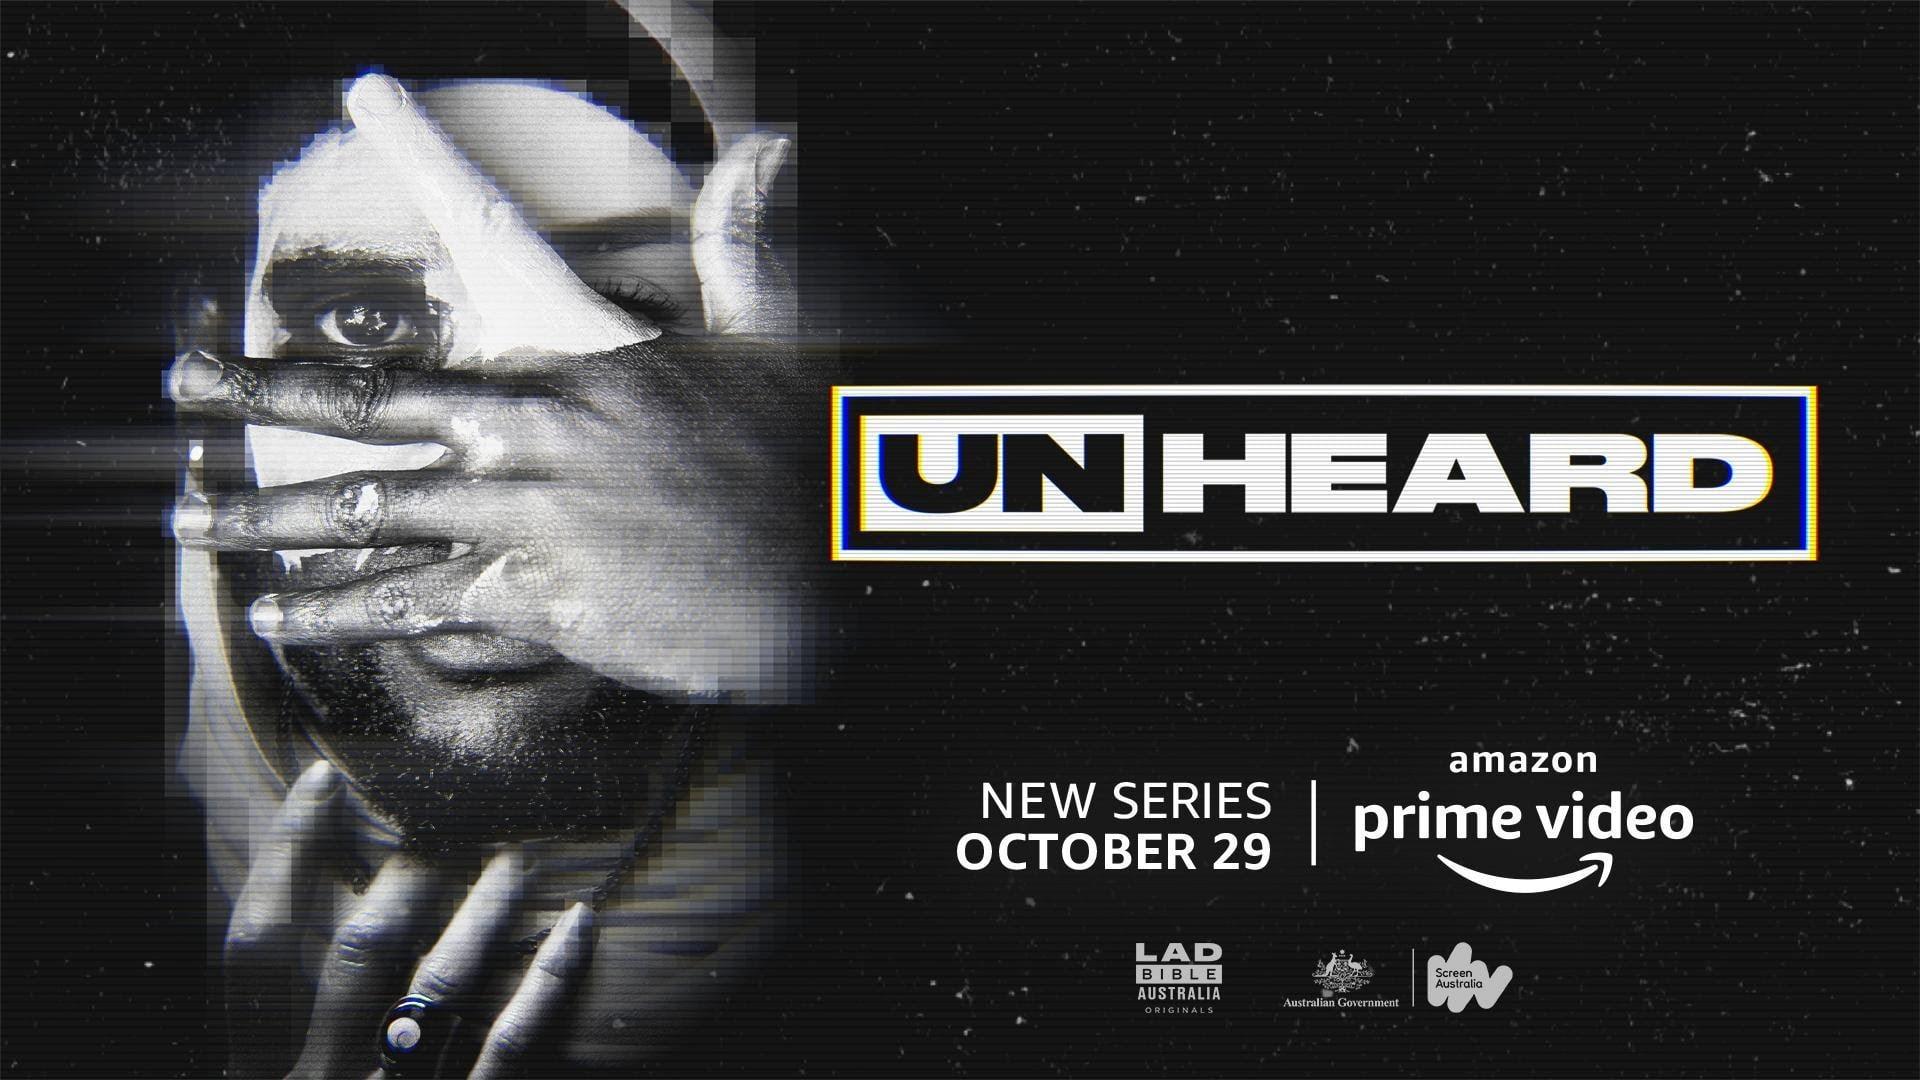 Unheard comes to Amazon Prime Video in October